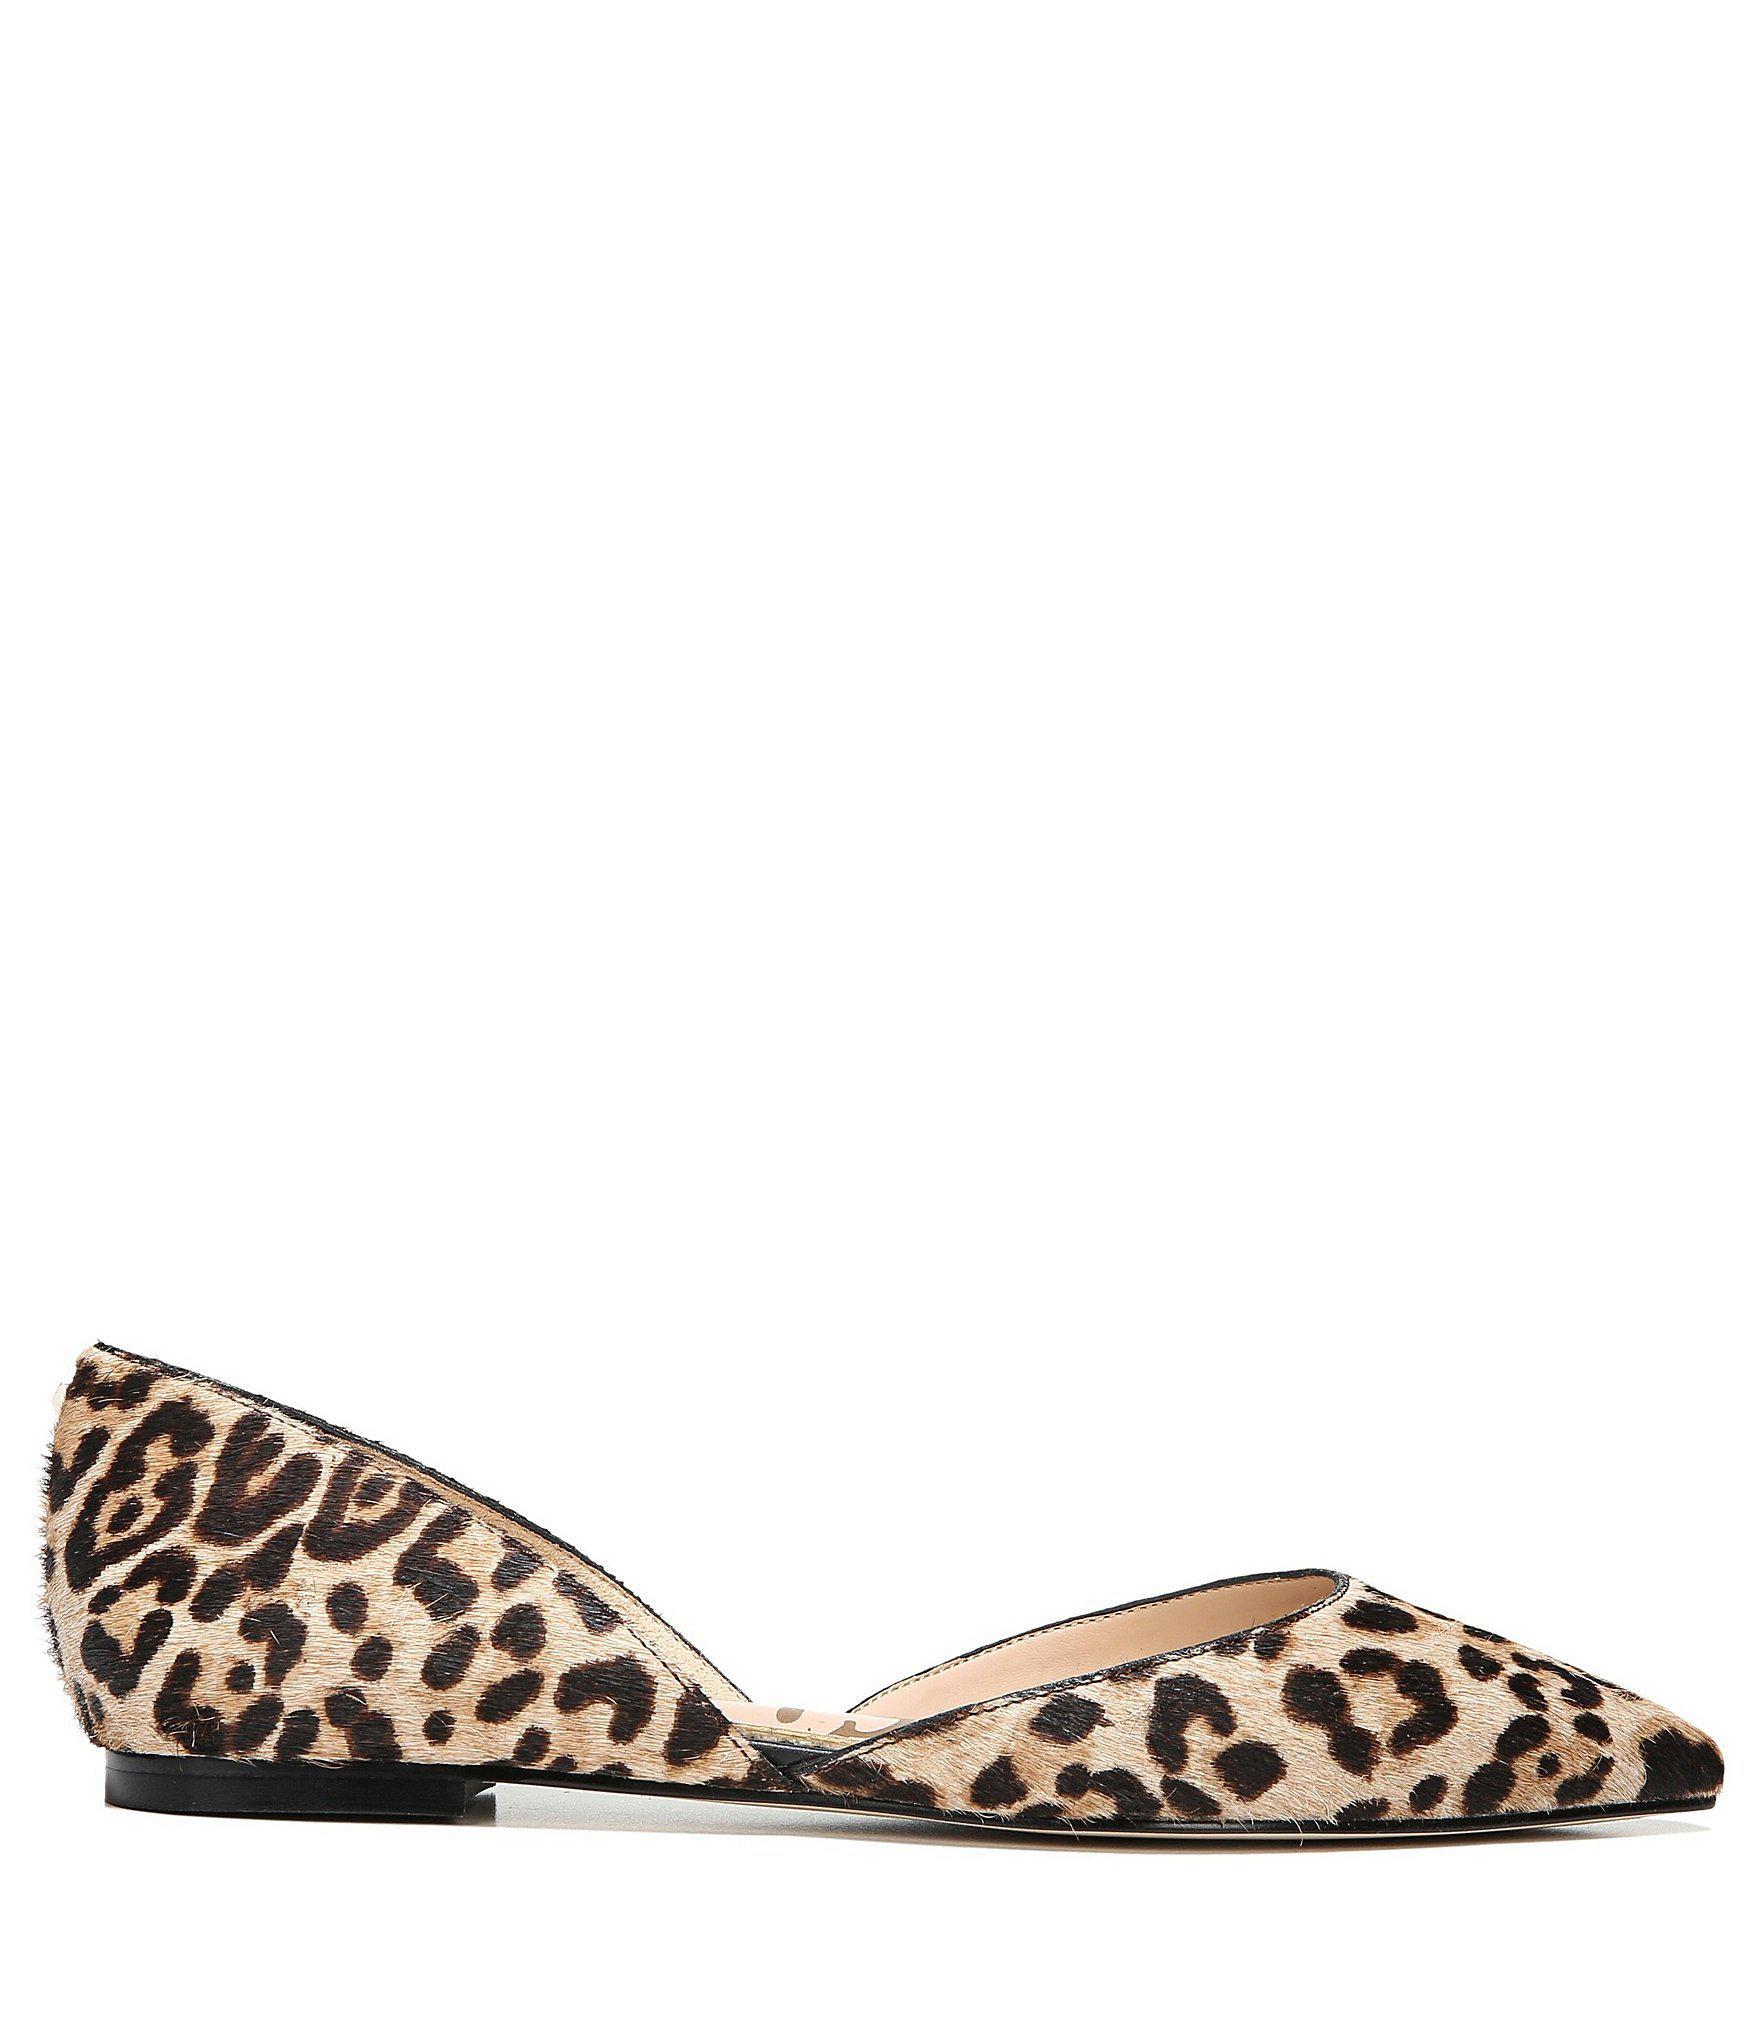 09c063ab1c7ba Sam Edelman - Multicolor Rodney Leopard Print Calf Hair Flats - Lyst. View  fullscreen